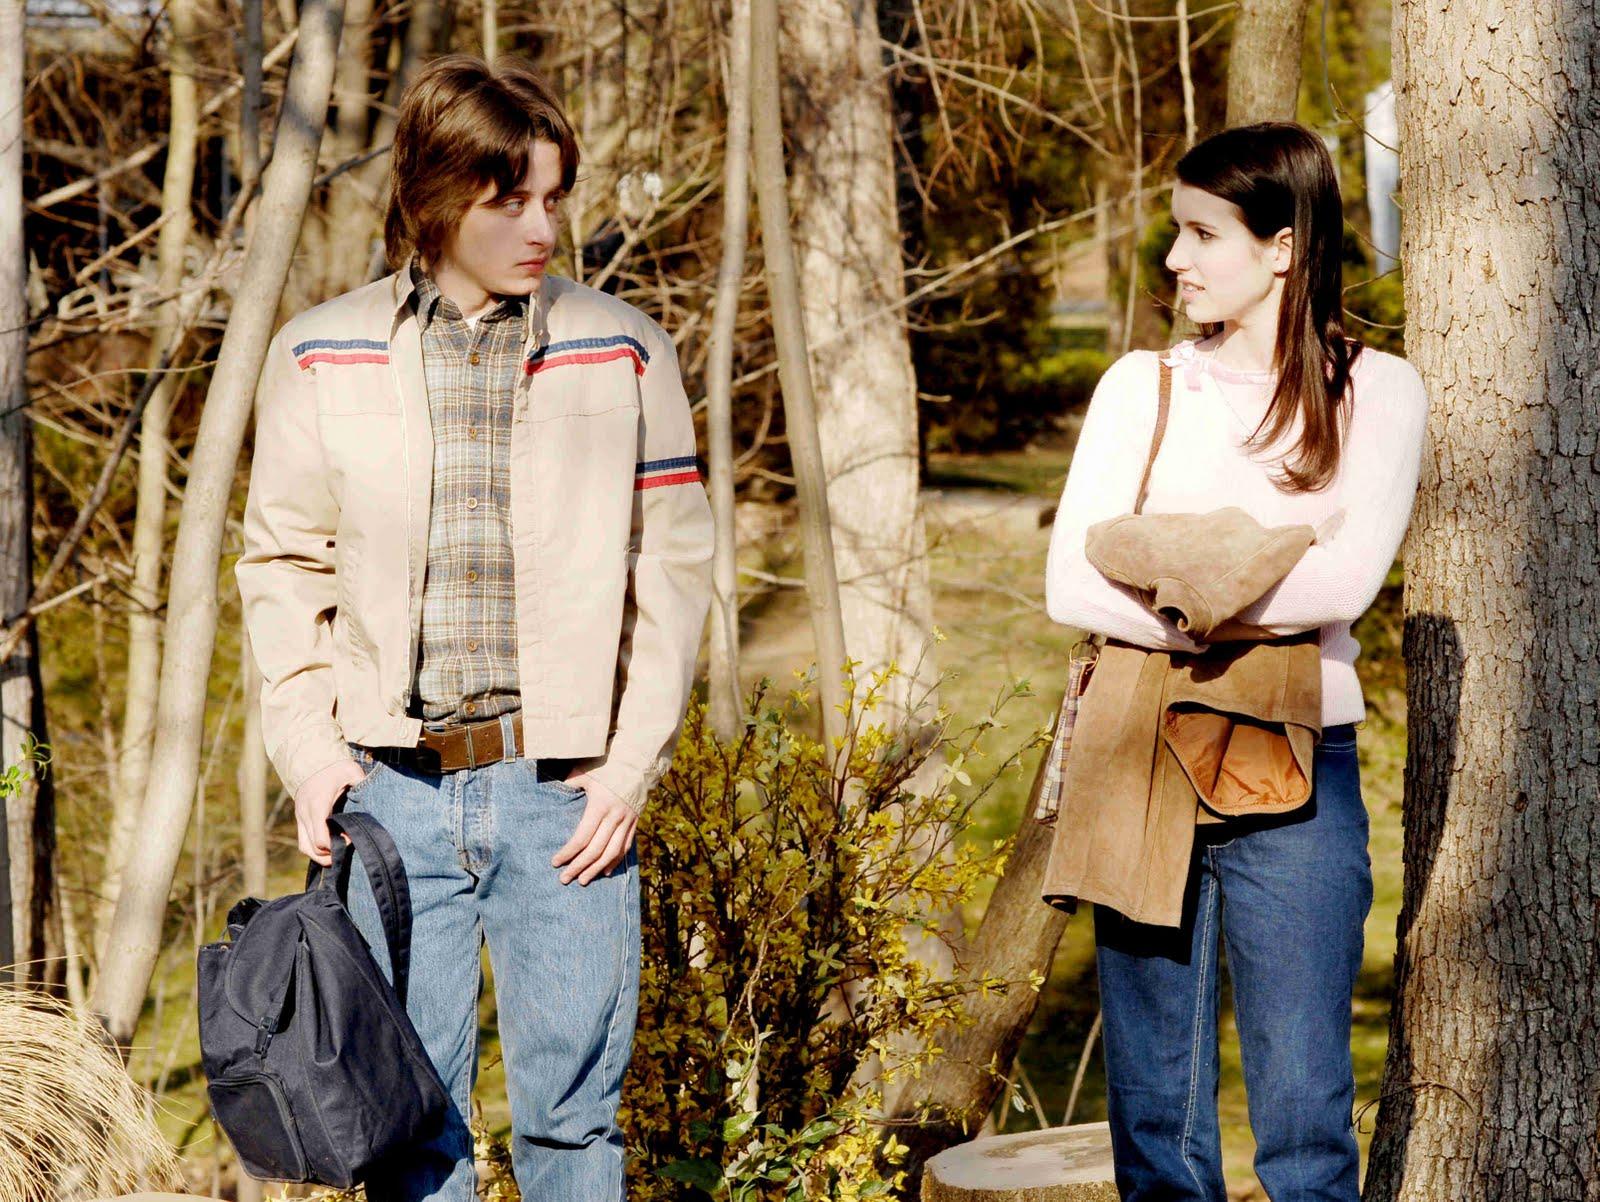 lymelife 2008 movie